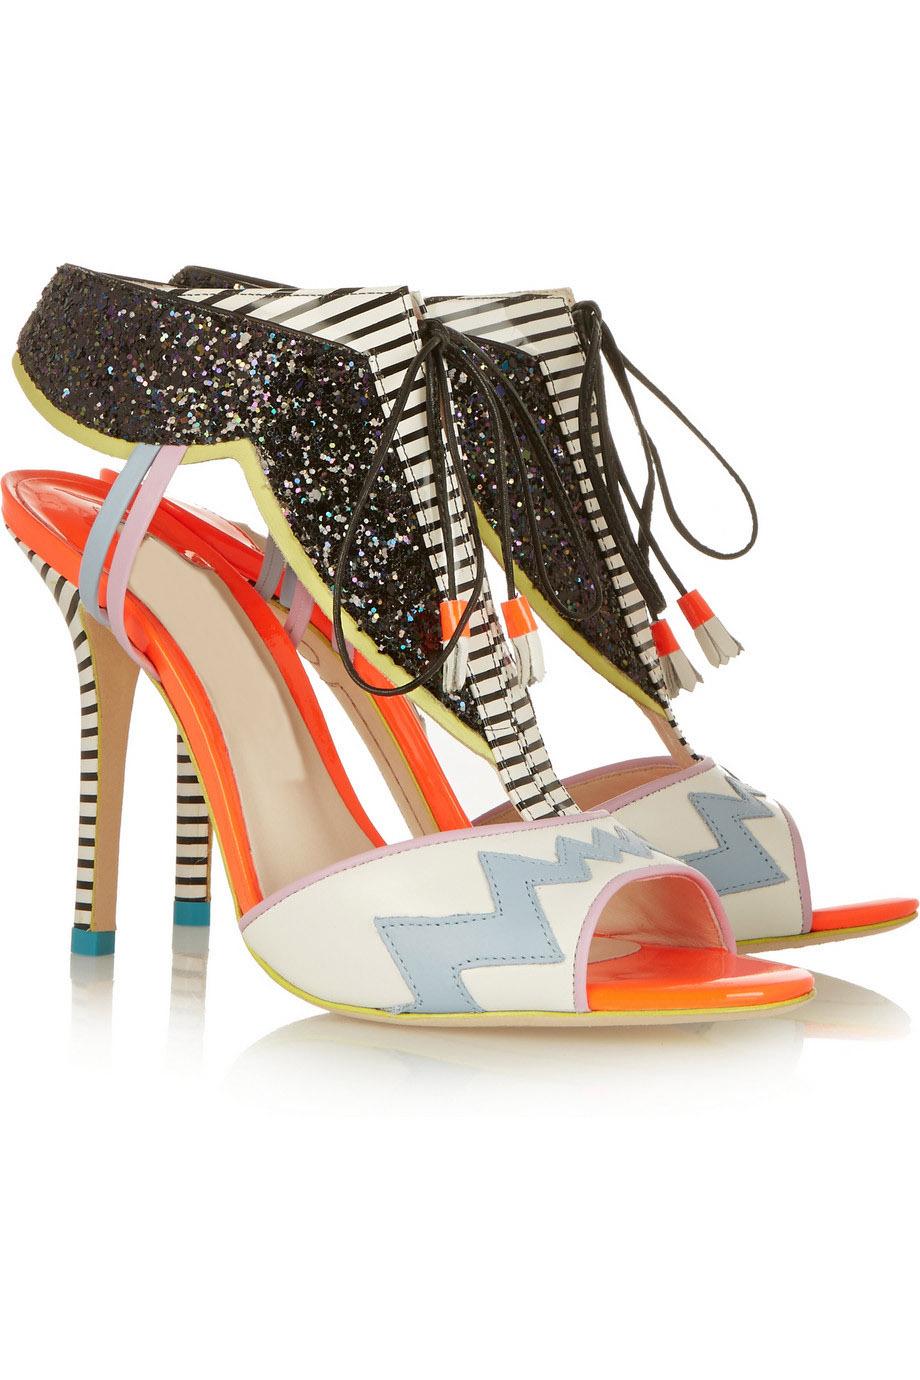 e94e67545b4 Buy New Bling Dress Shoes Sandale Femme Peep Toe Black White Print Heels  Shoes Woman Sandals 2015 Brand in Cheap Price on Alibaba.com